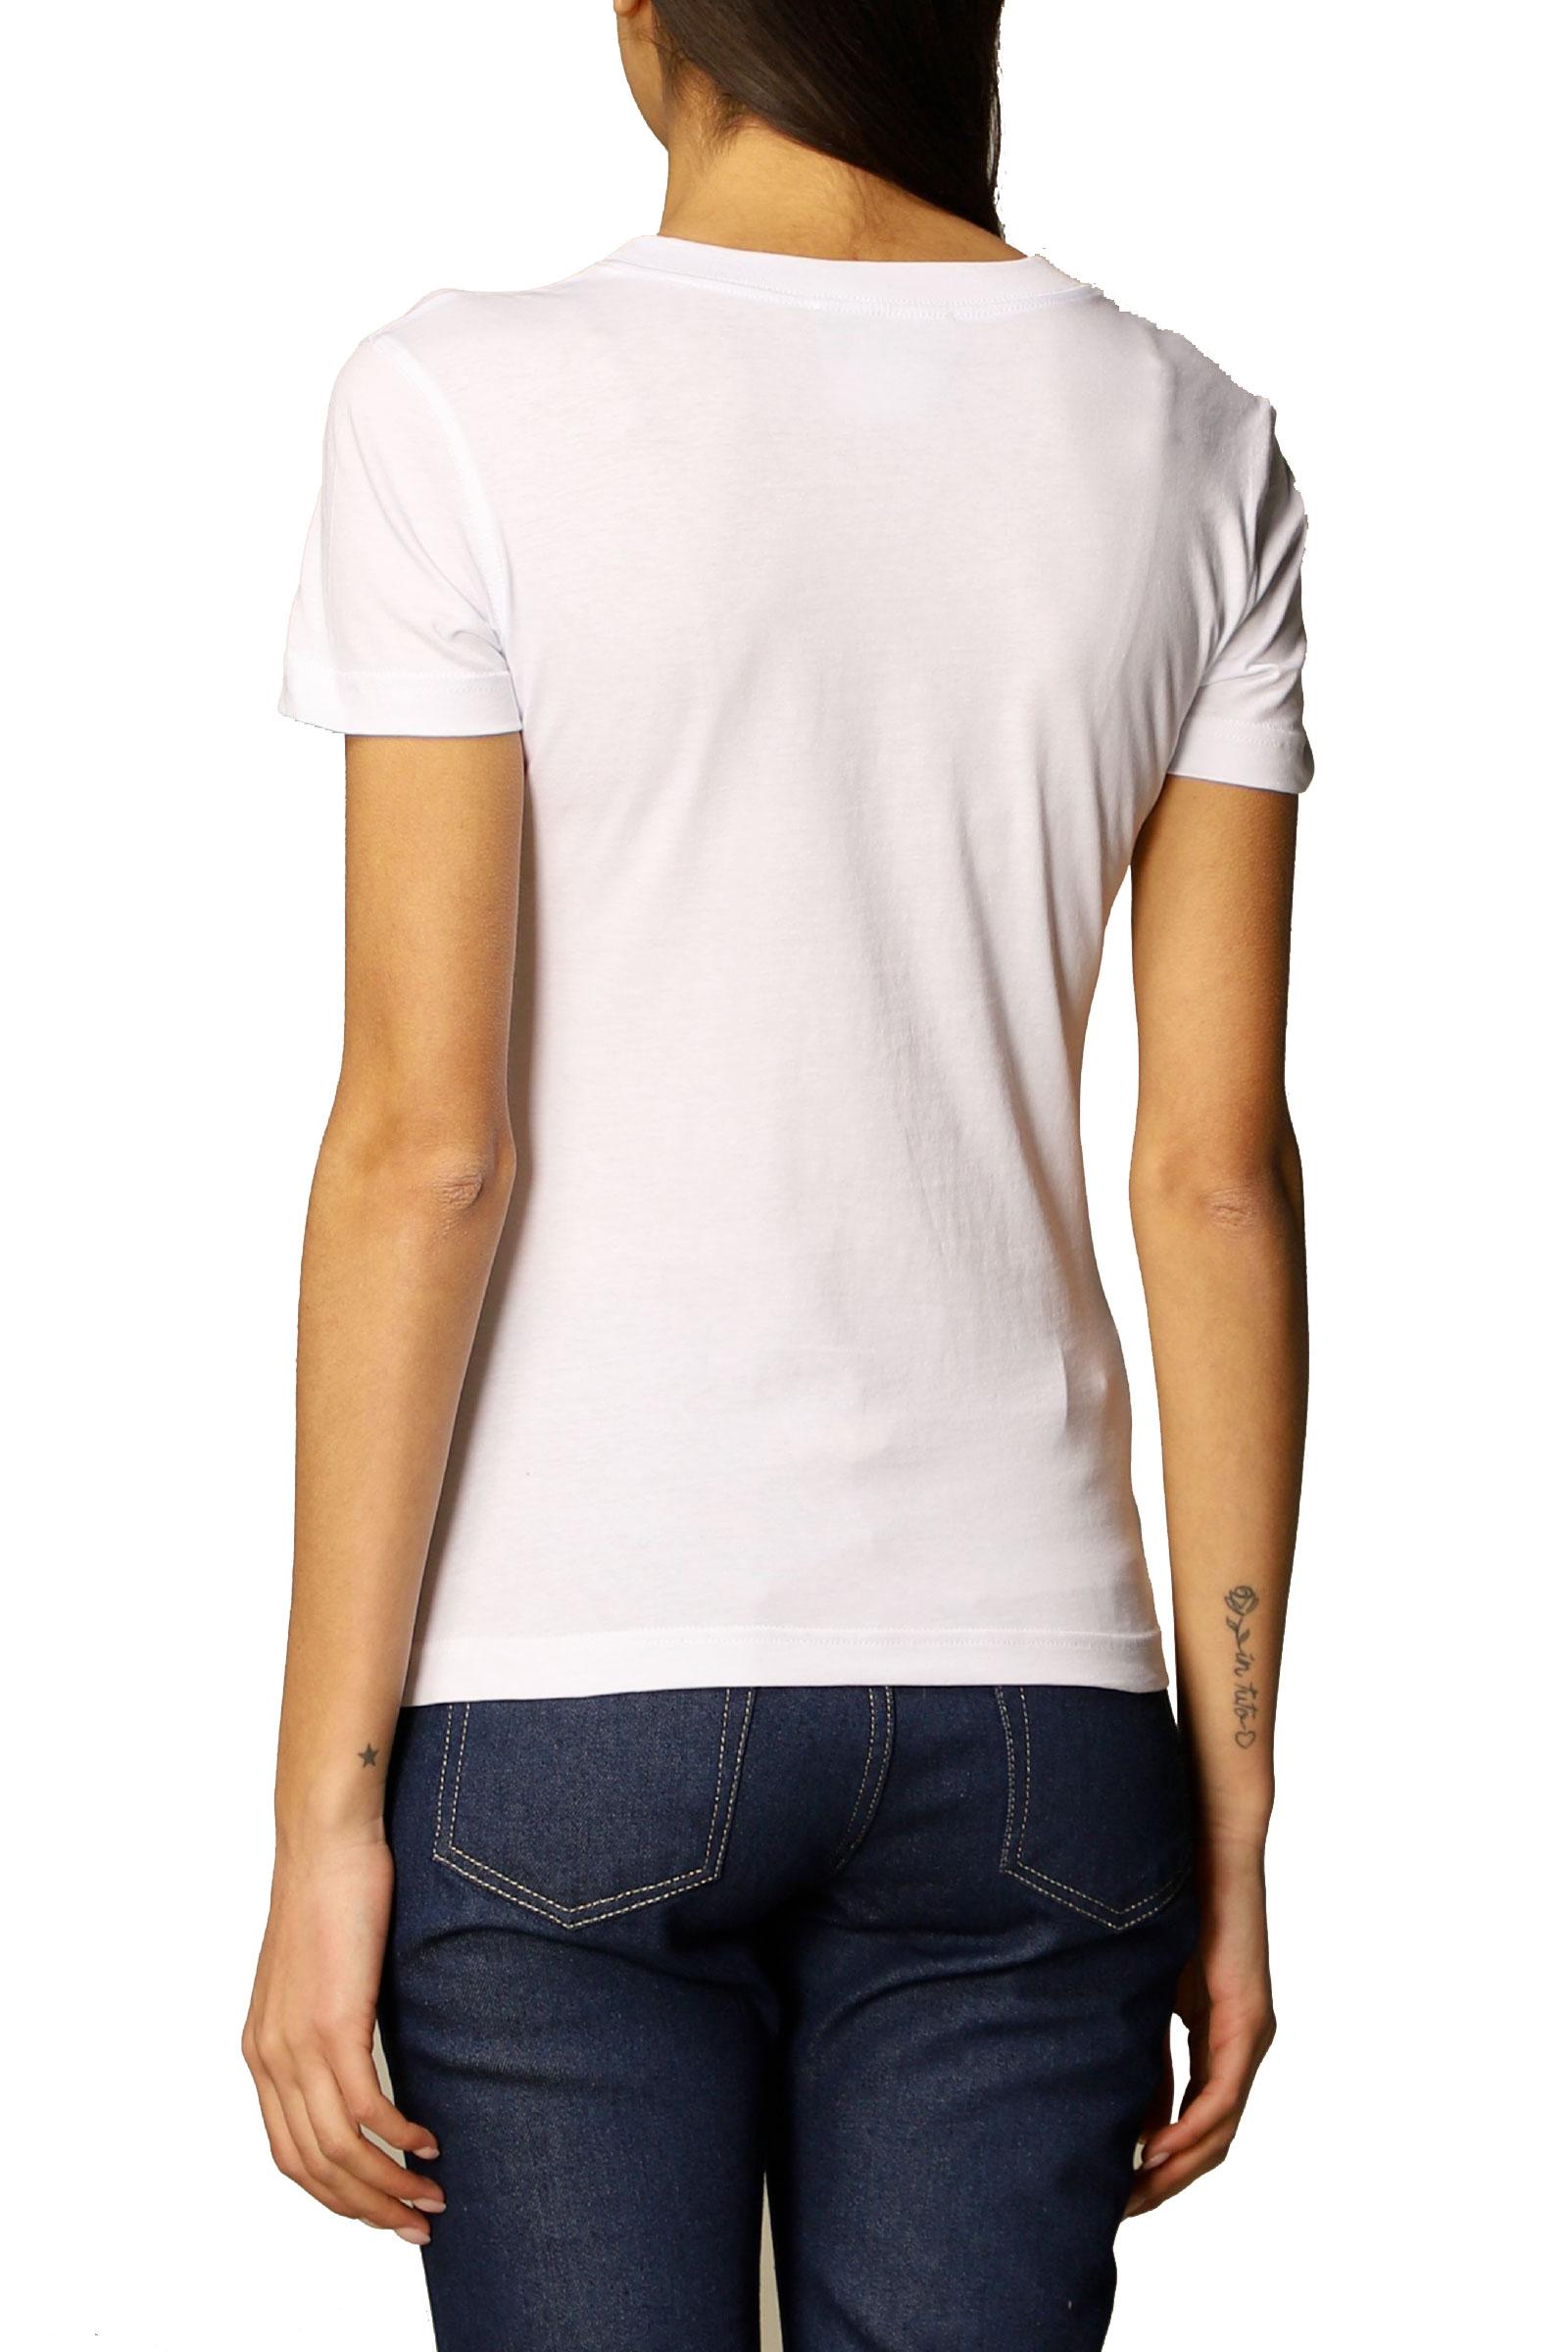 VERSACE JEANS COUTURE T-Shirt Donna VERSACE JEANS COUTURE | T-Shirt | B2HWA7TB30319K41